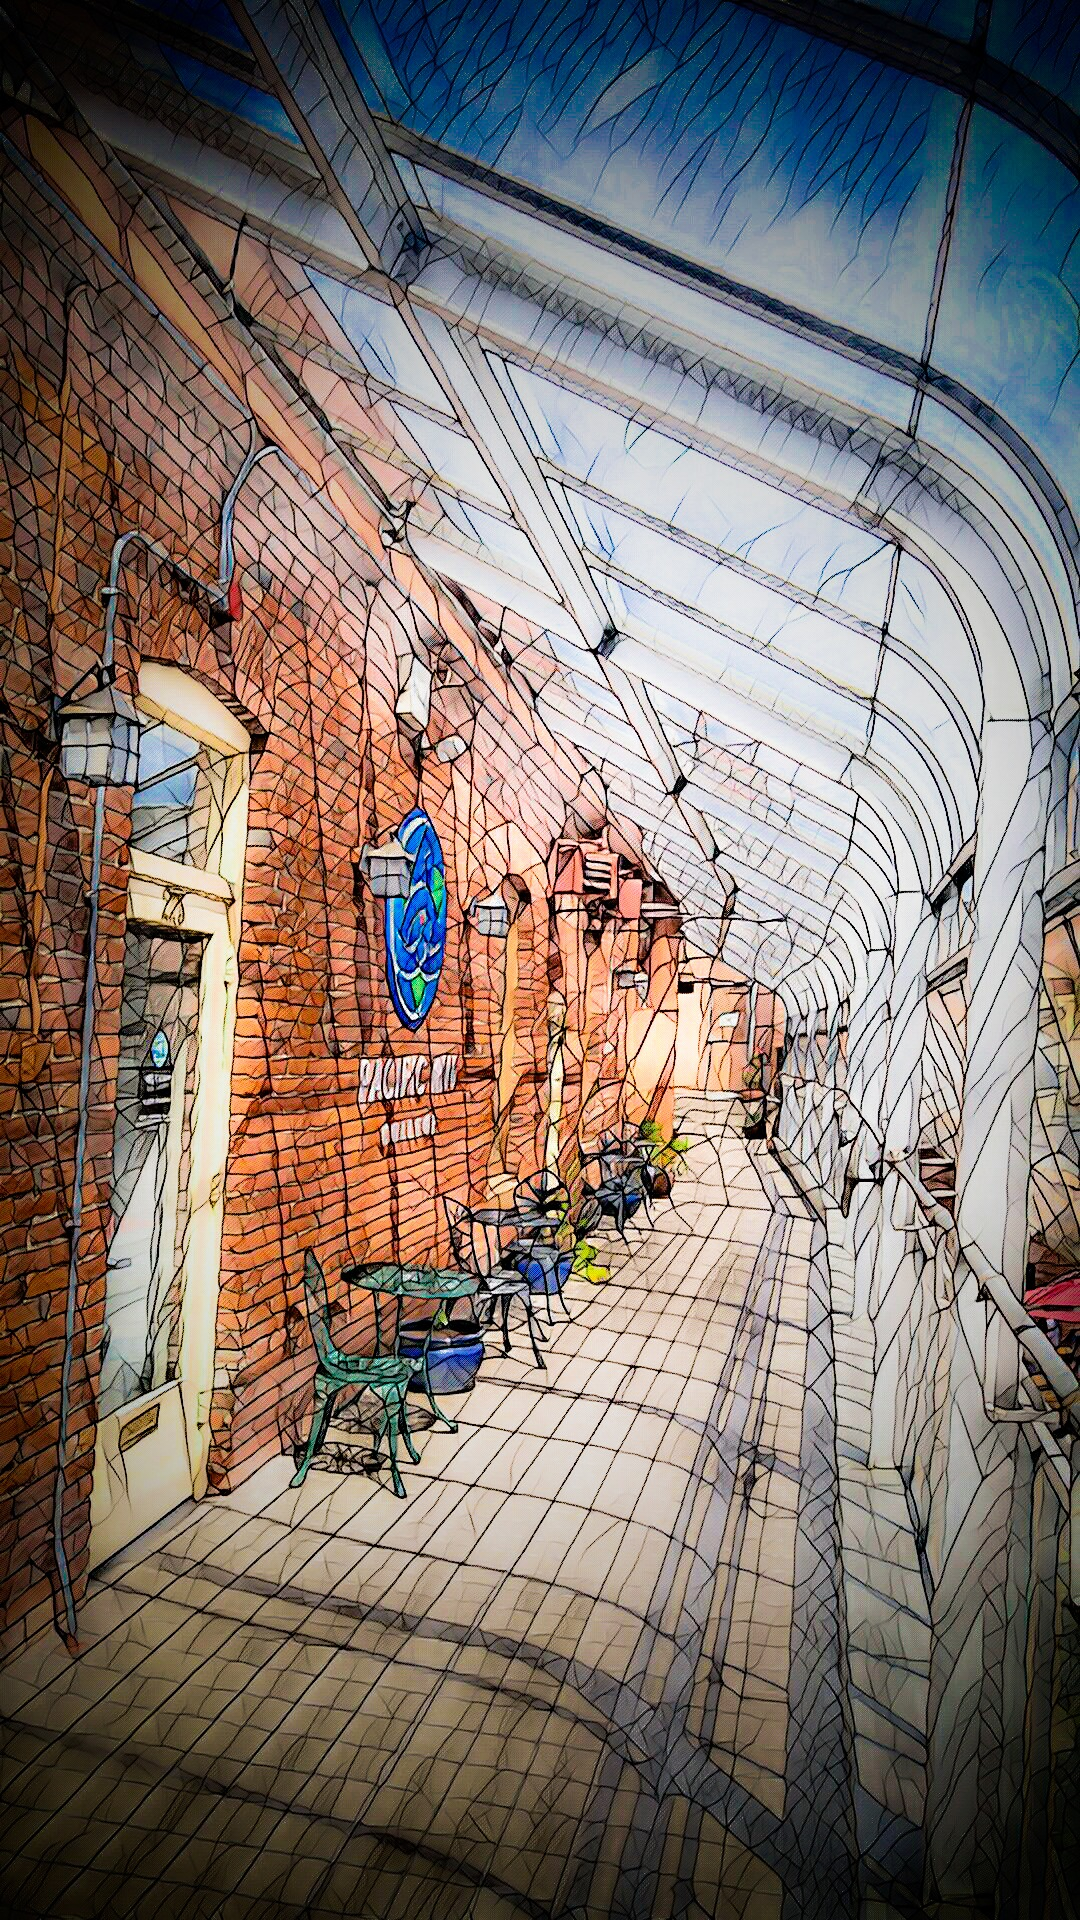 Market square by Troy Haddad